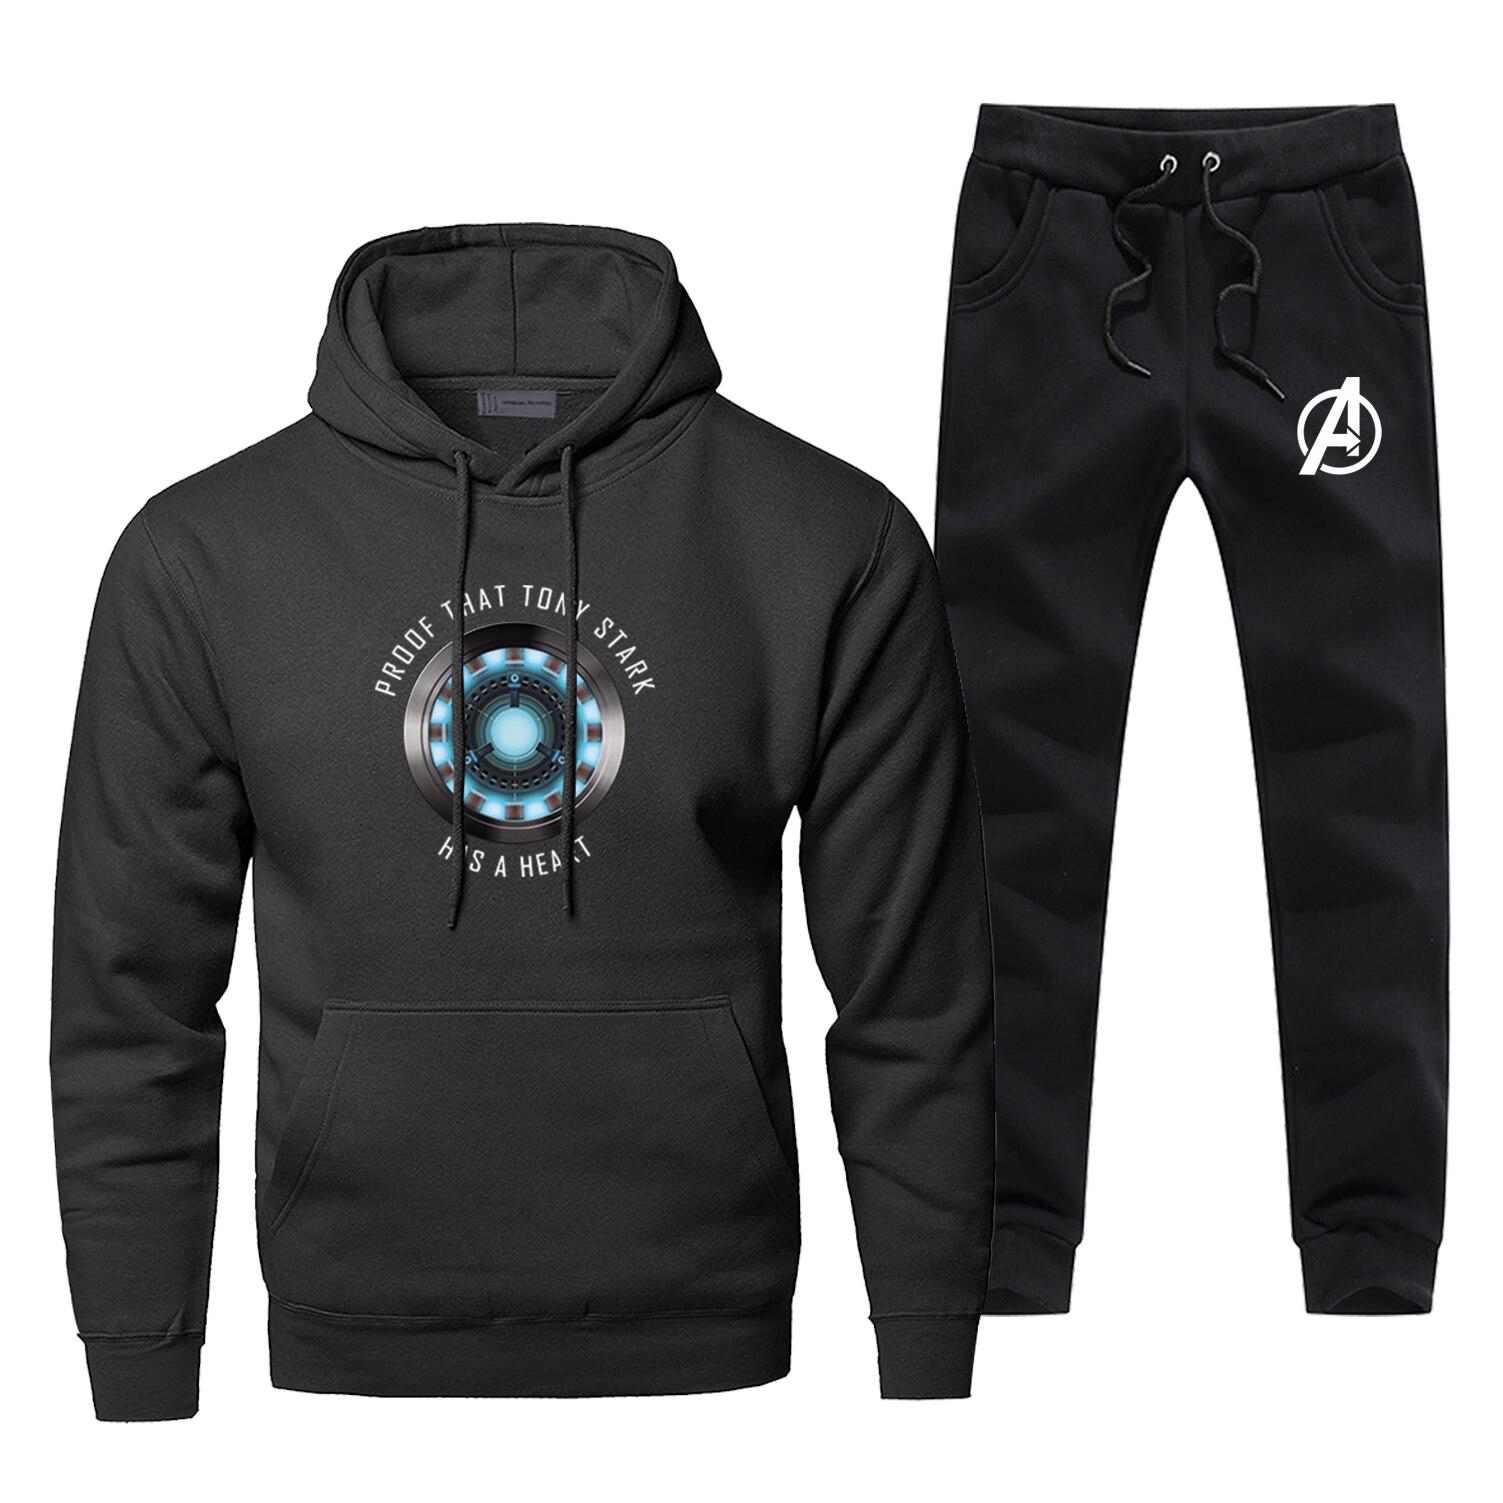 Men Iron Man Hoodie Male Pants Set Avengers Sweatshirt Mens Hoodies Sweatshirts Superhero Sets Two Piece Pant Pullover 2Pcs Coat